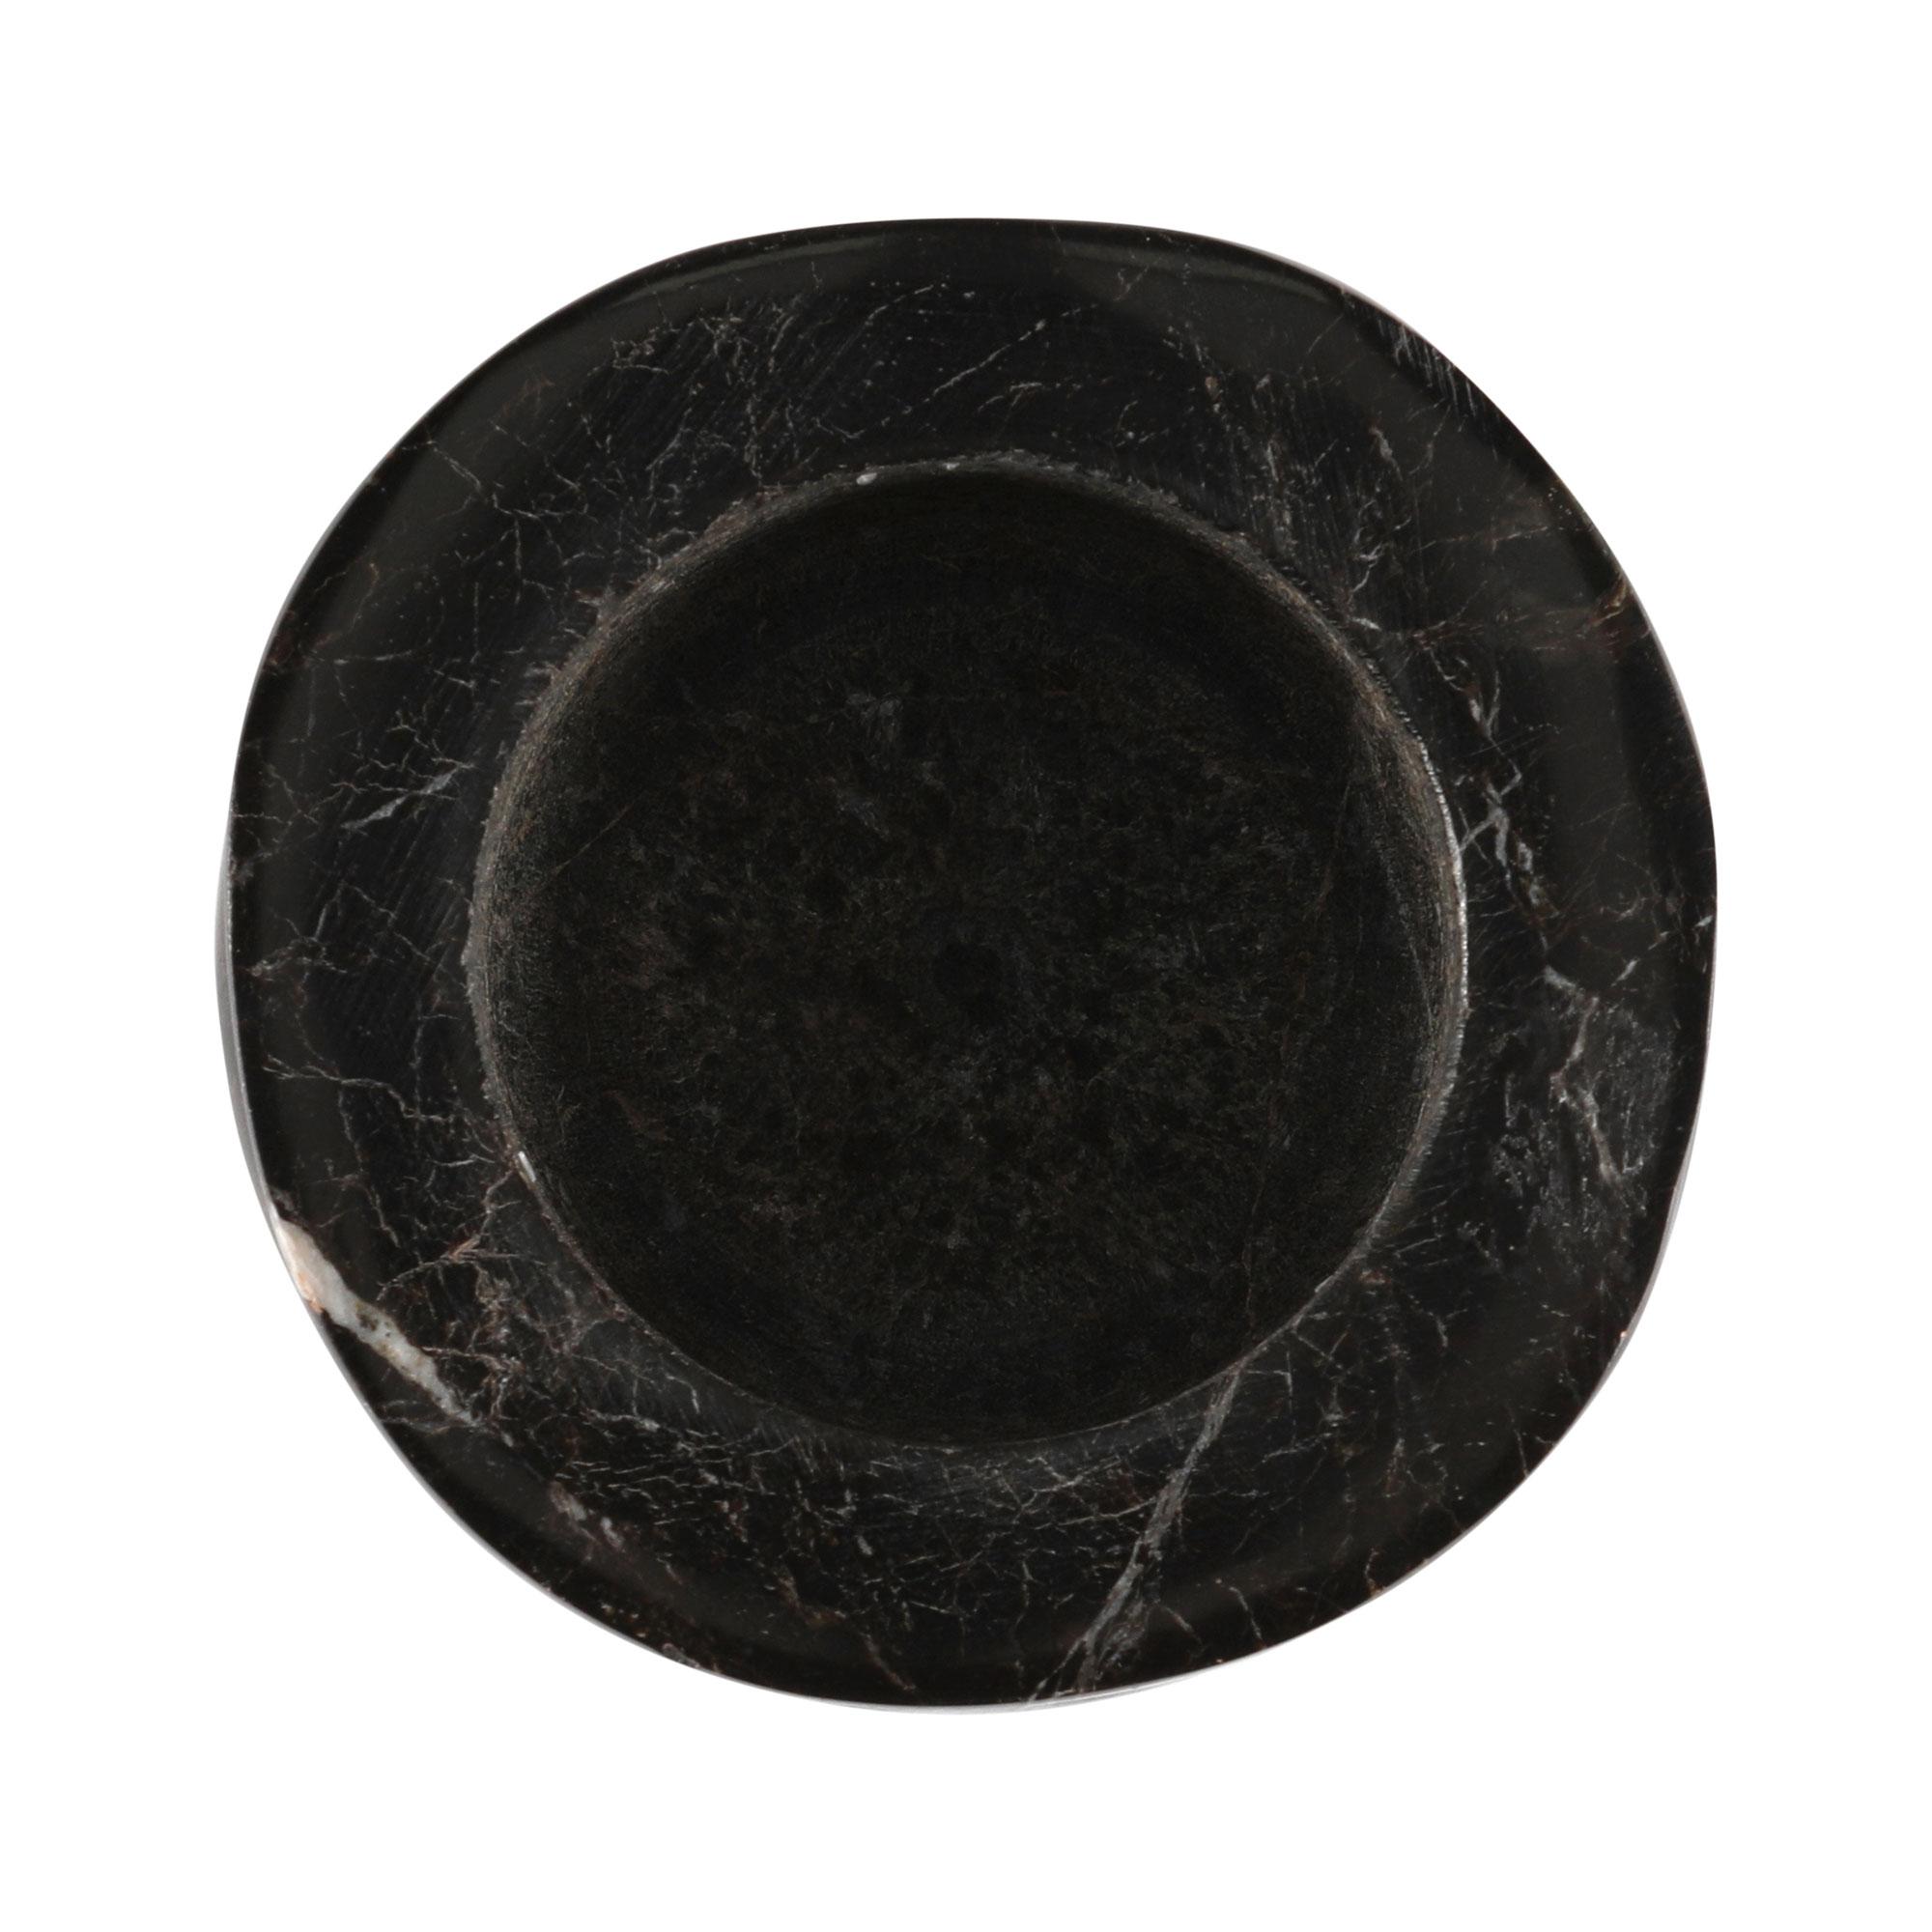 "Porta velas ""Torre"" esculpido em ônix negro"